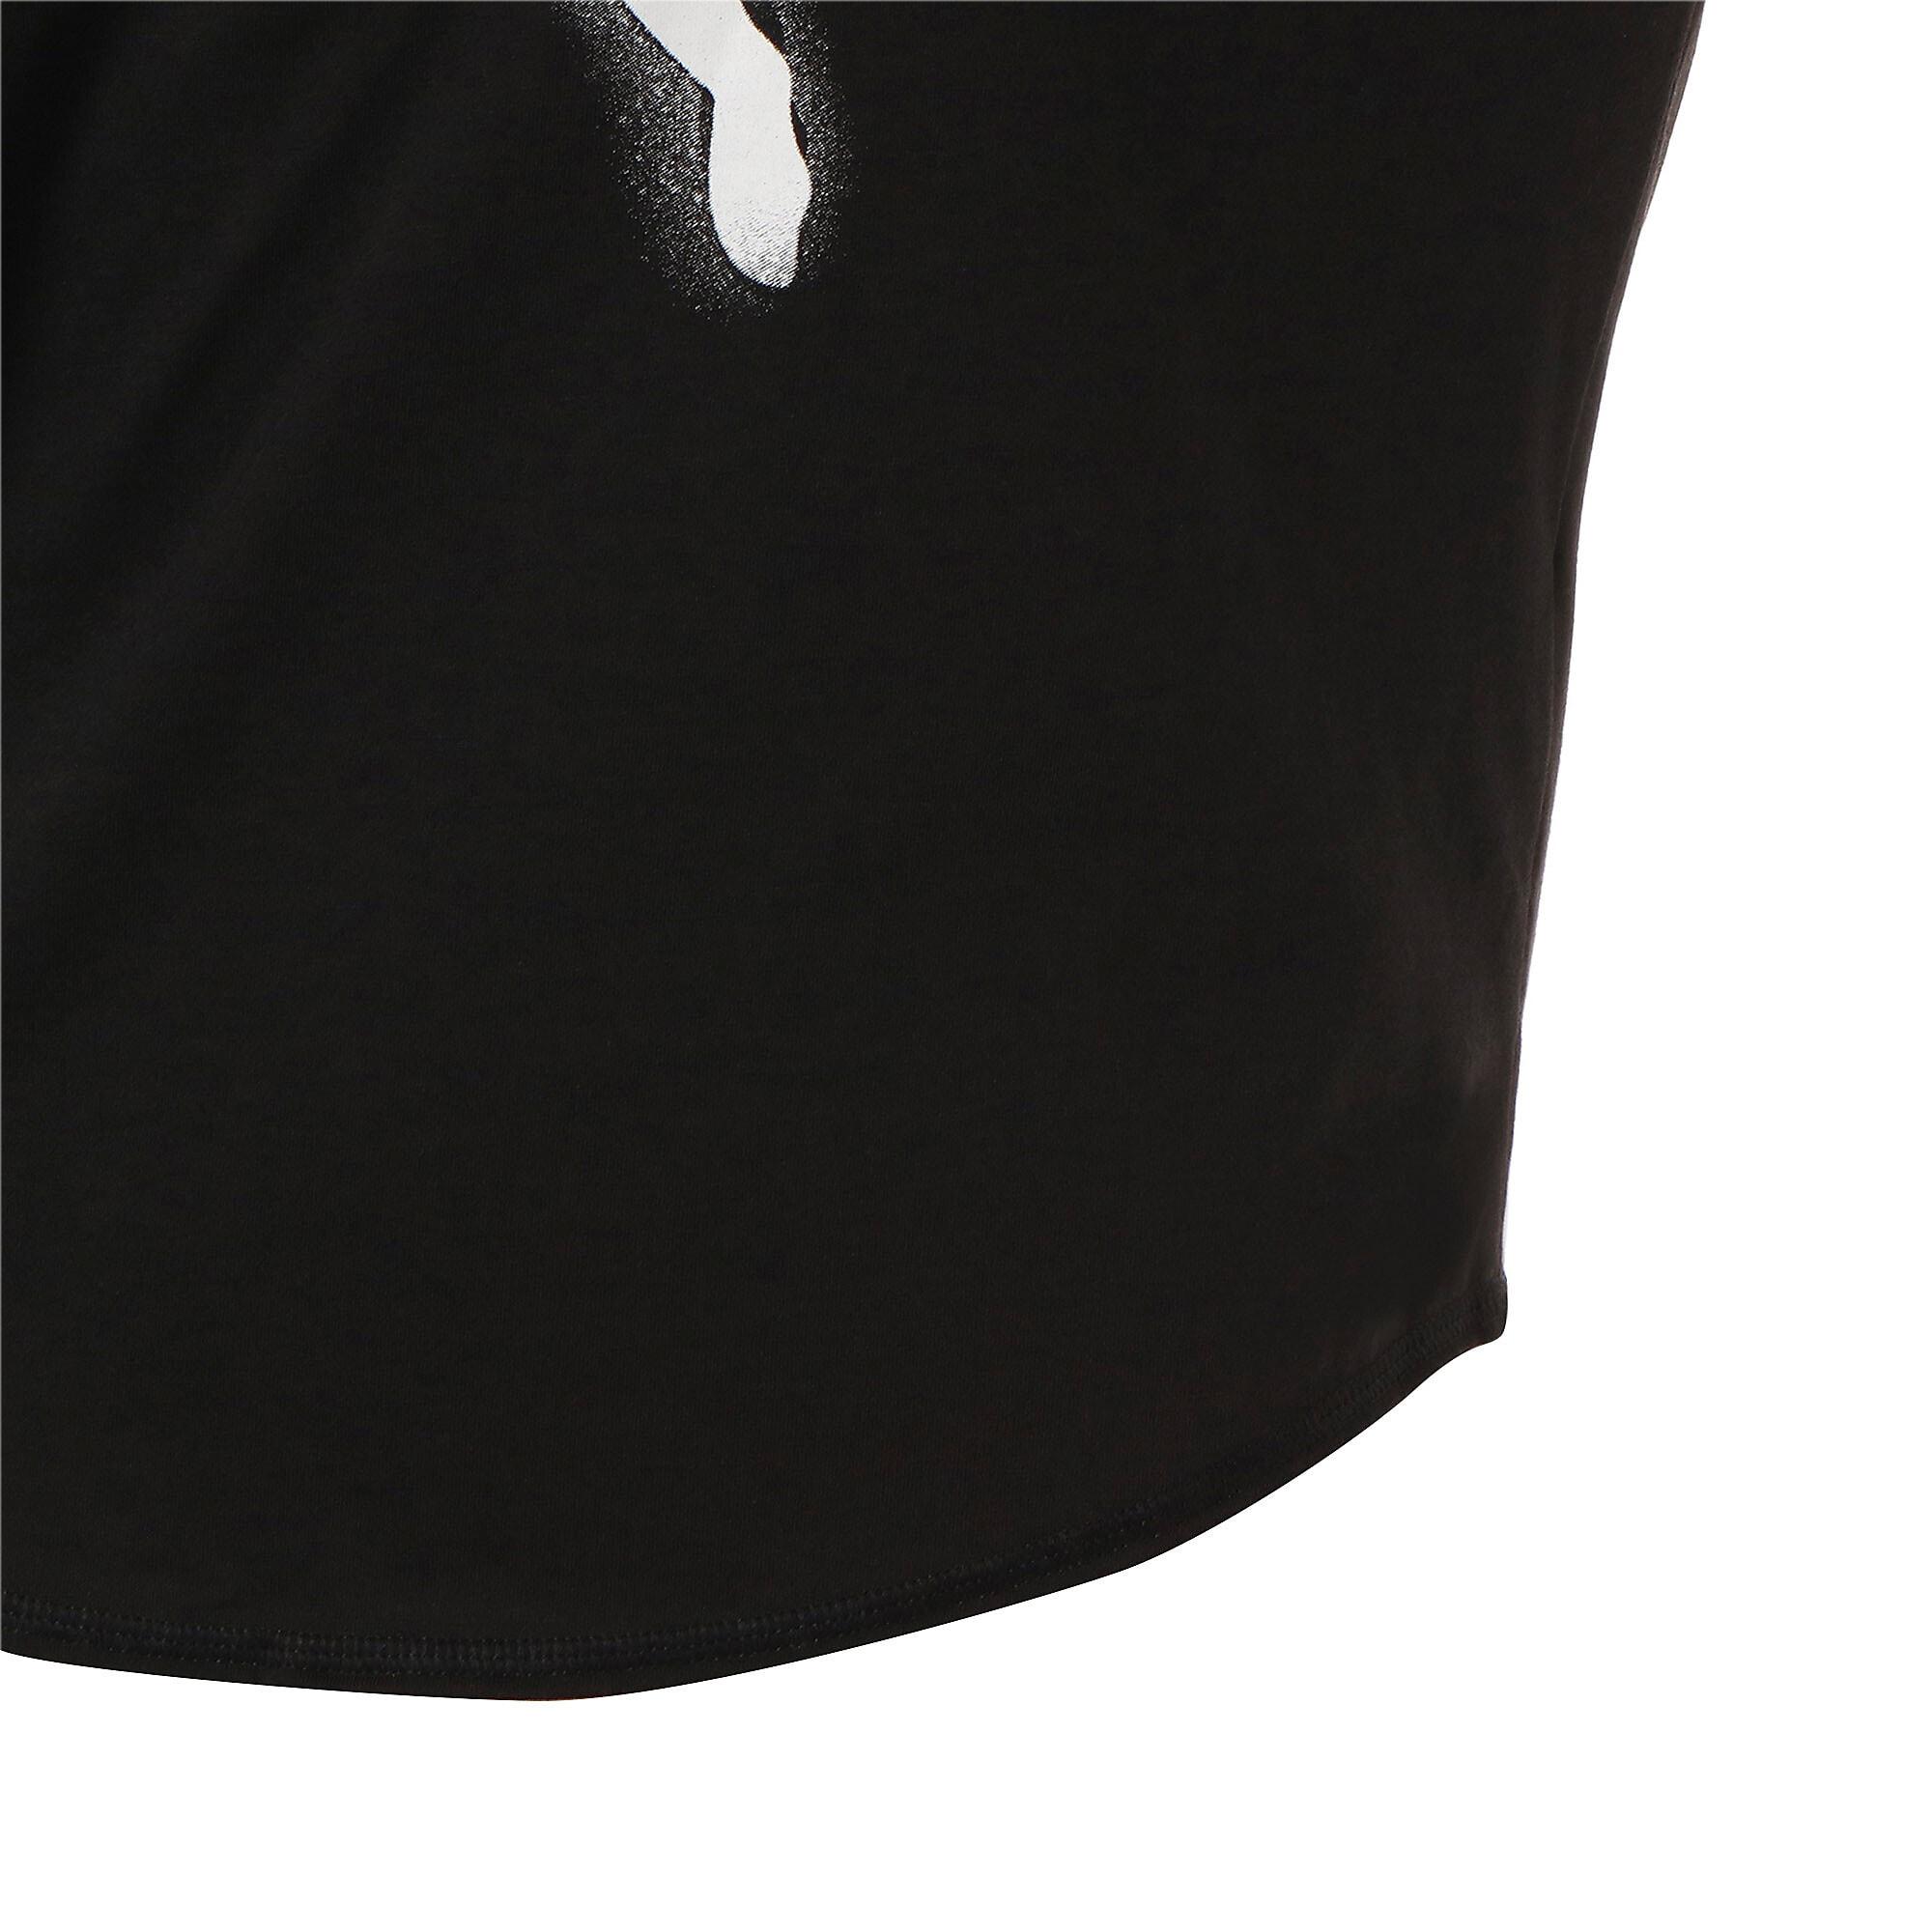 Thumbnail 9 of スタジオ SS ウィメンズ トレーニング メッシュ キャット Tシャツ 半袖, Puma Black-Yellow Alert, medium-JPN